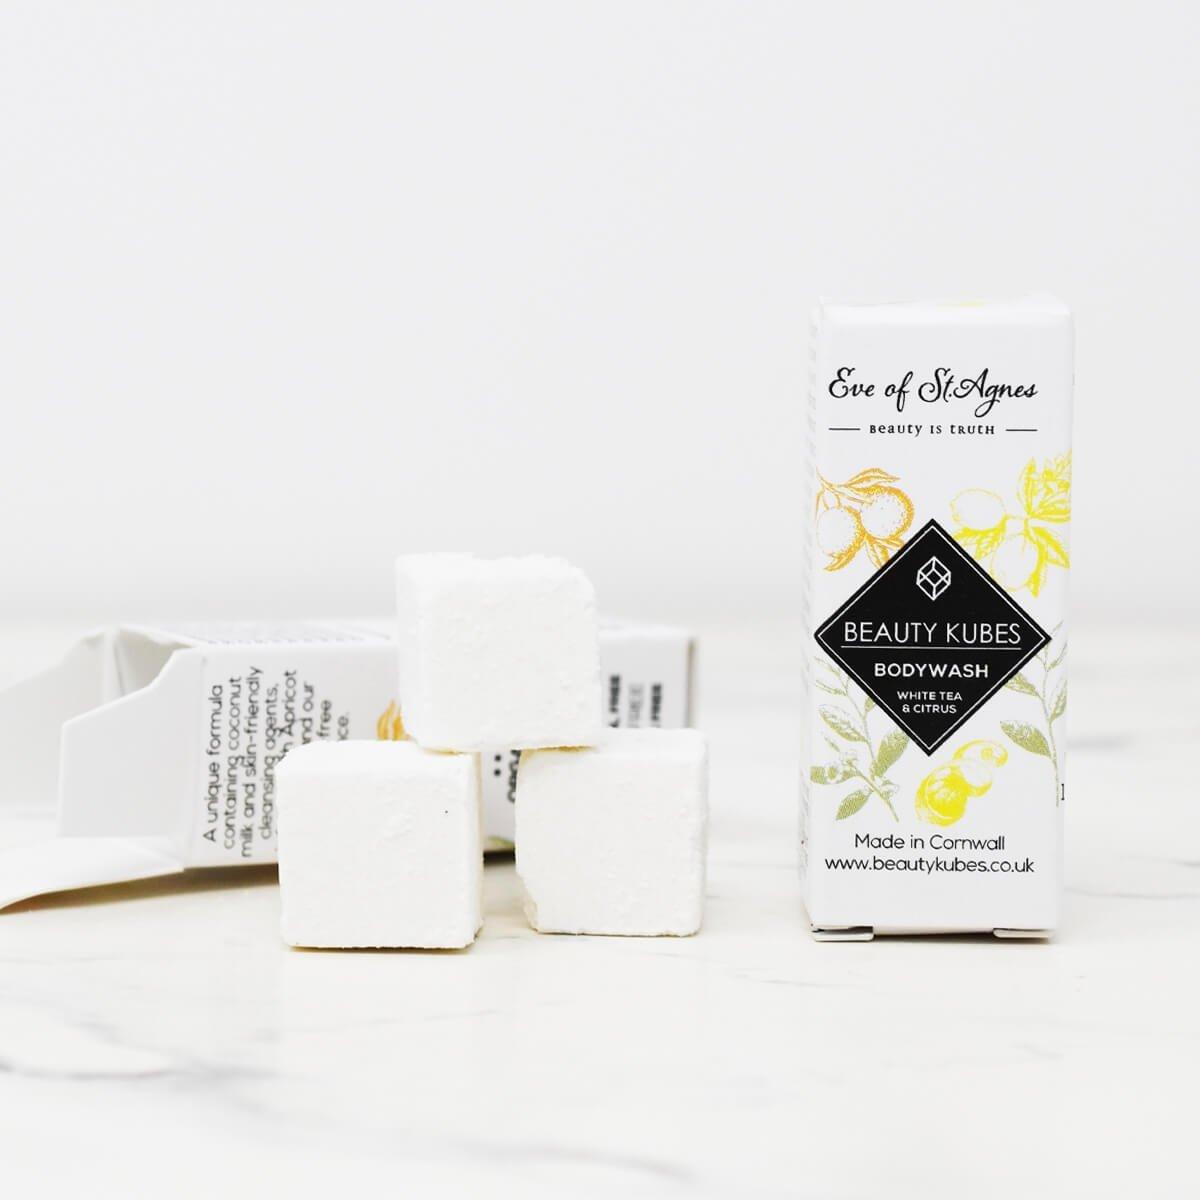 Beauty Kubes, Body Wash, White Tea & Citrus, bodywash cubes, bath, shower, soap bar, vegan-friendly, plastic-free, beauty kubes mini, travel soap bar,